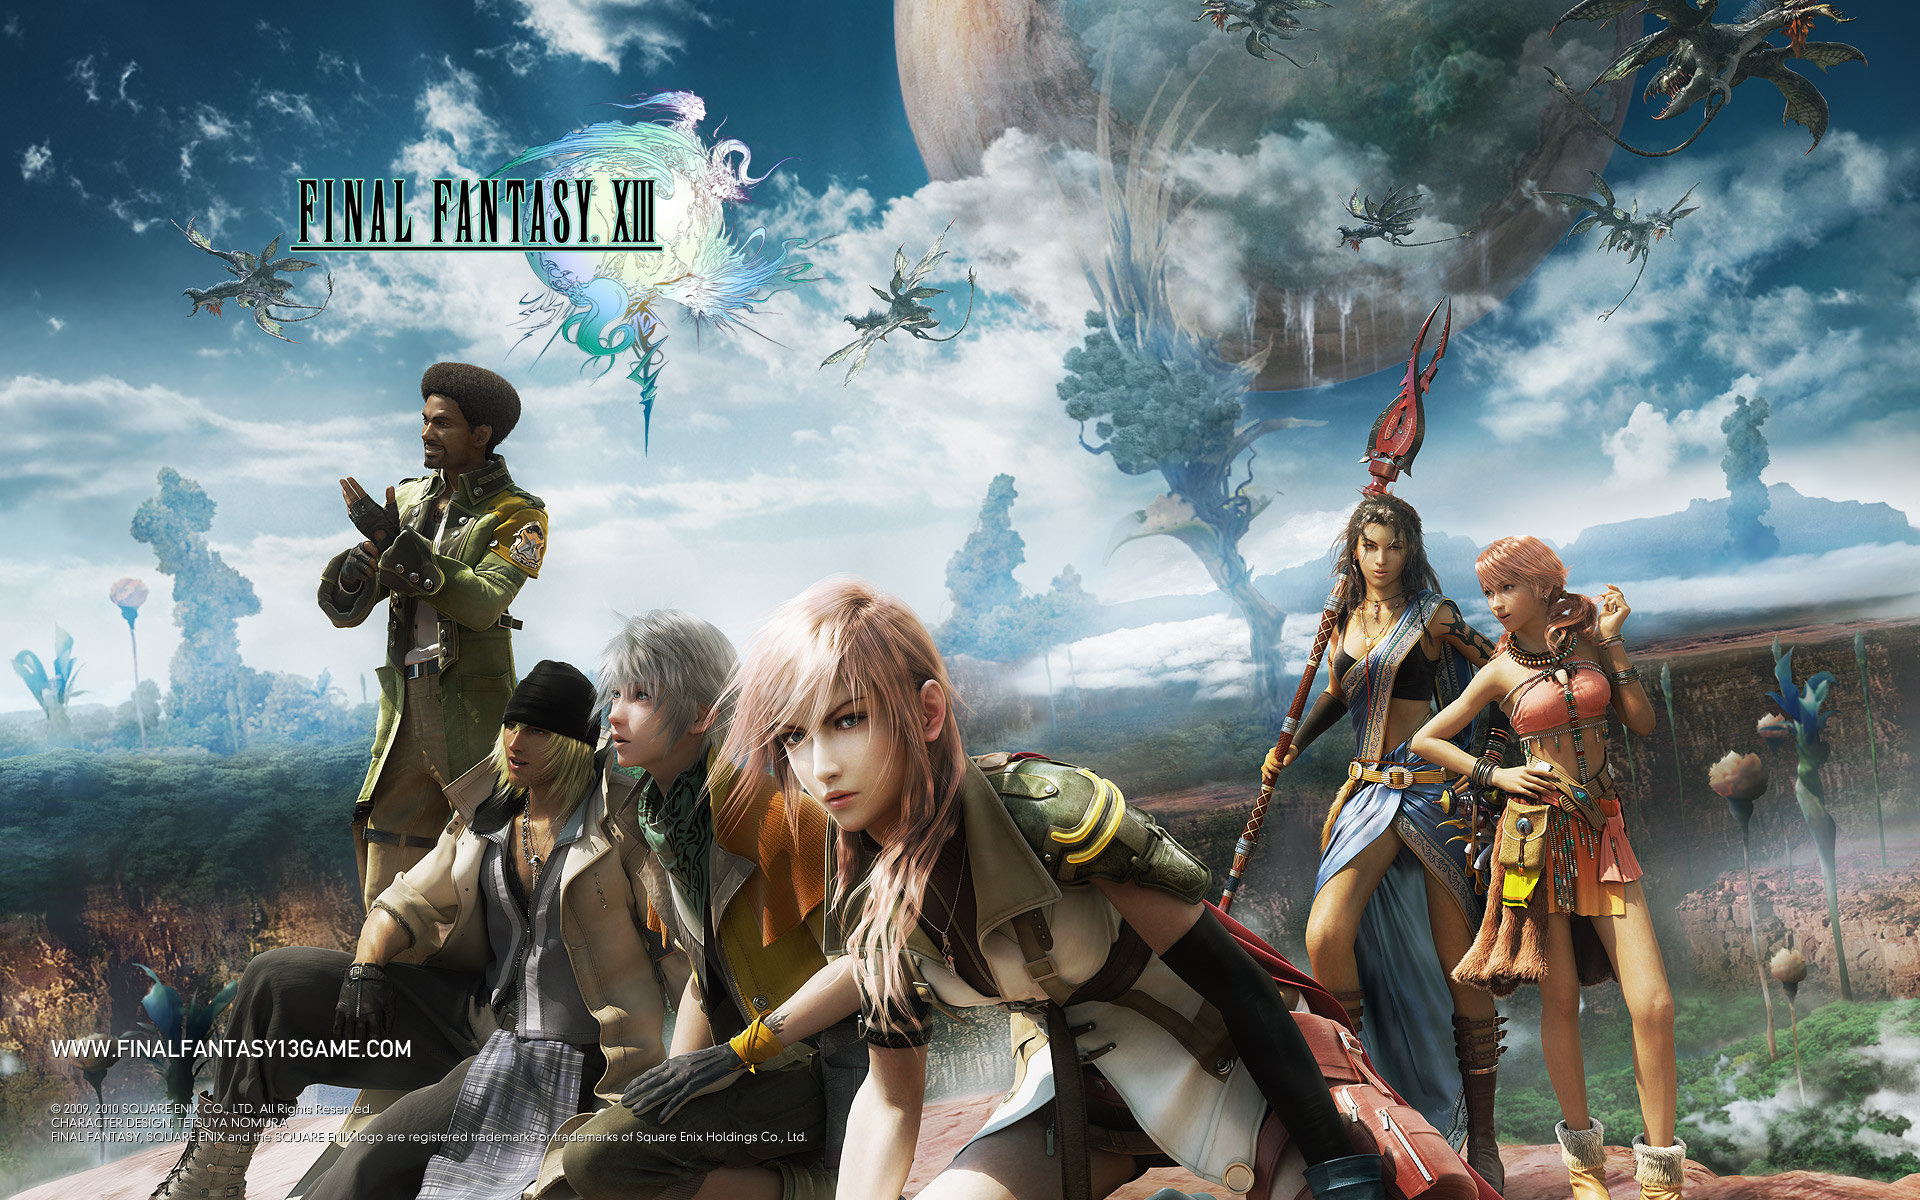 Final Fantasy 13 Wallpaper Full HD 1080p Wallpaper HD Widescreen 1920x1200